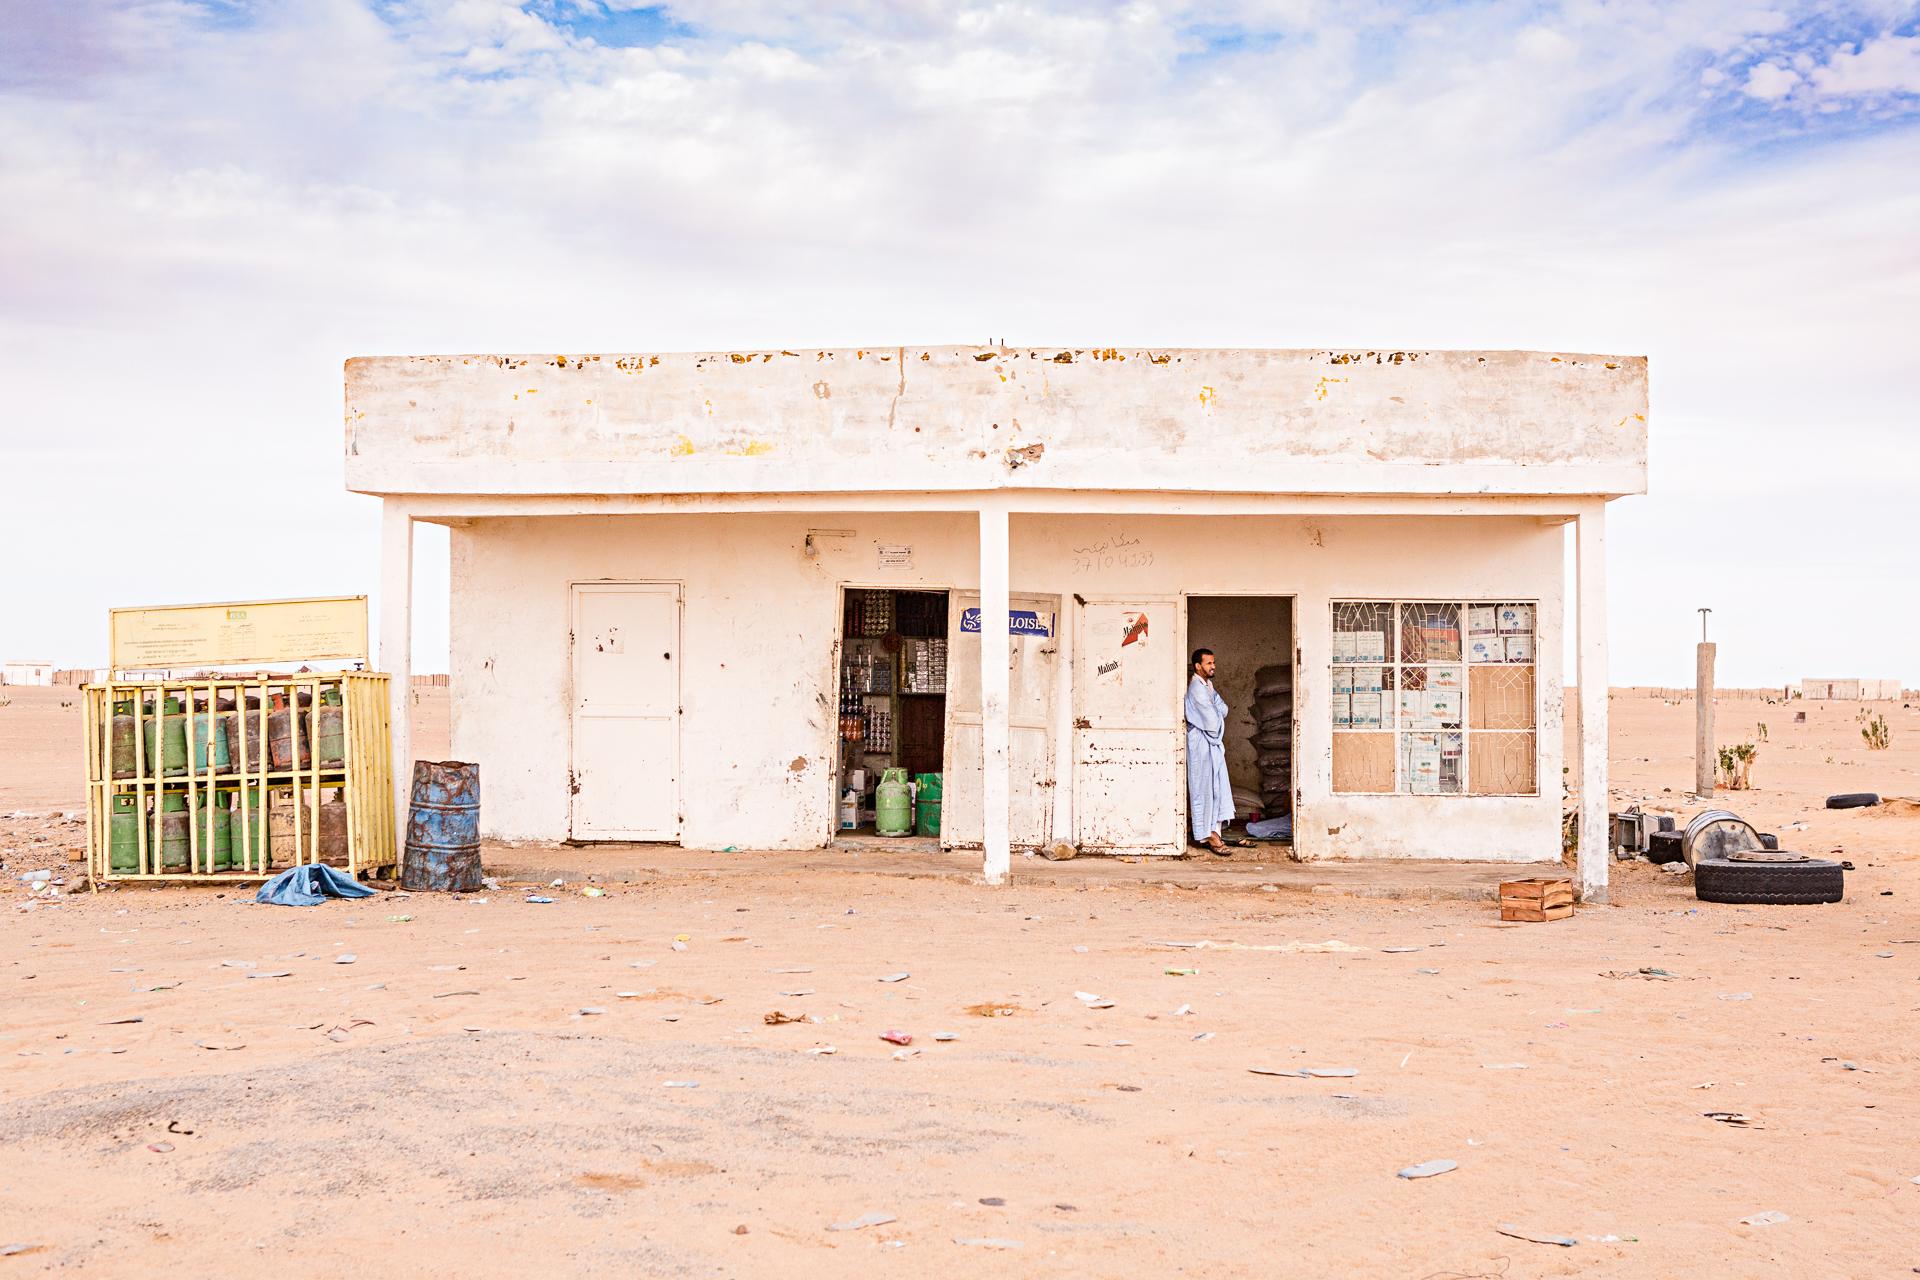 Station services Nouakchott Atar Mauritanie